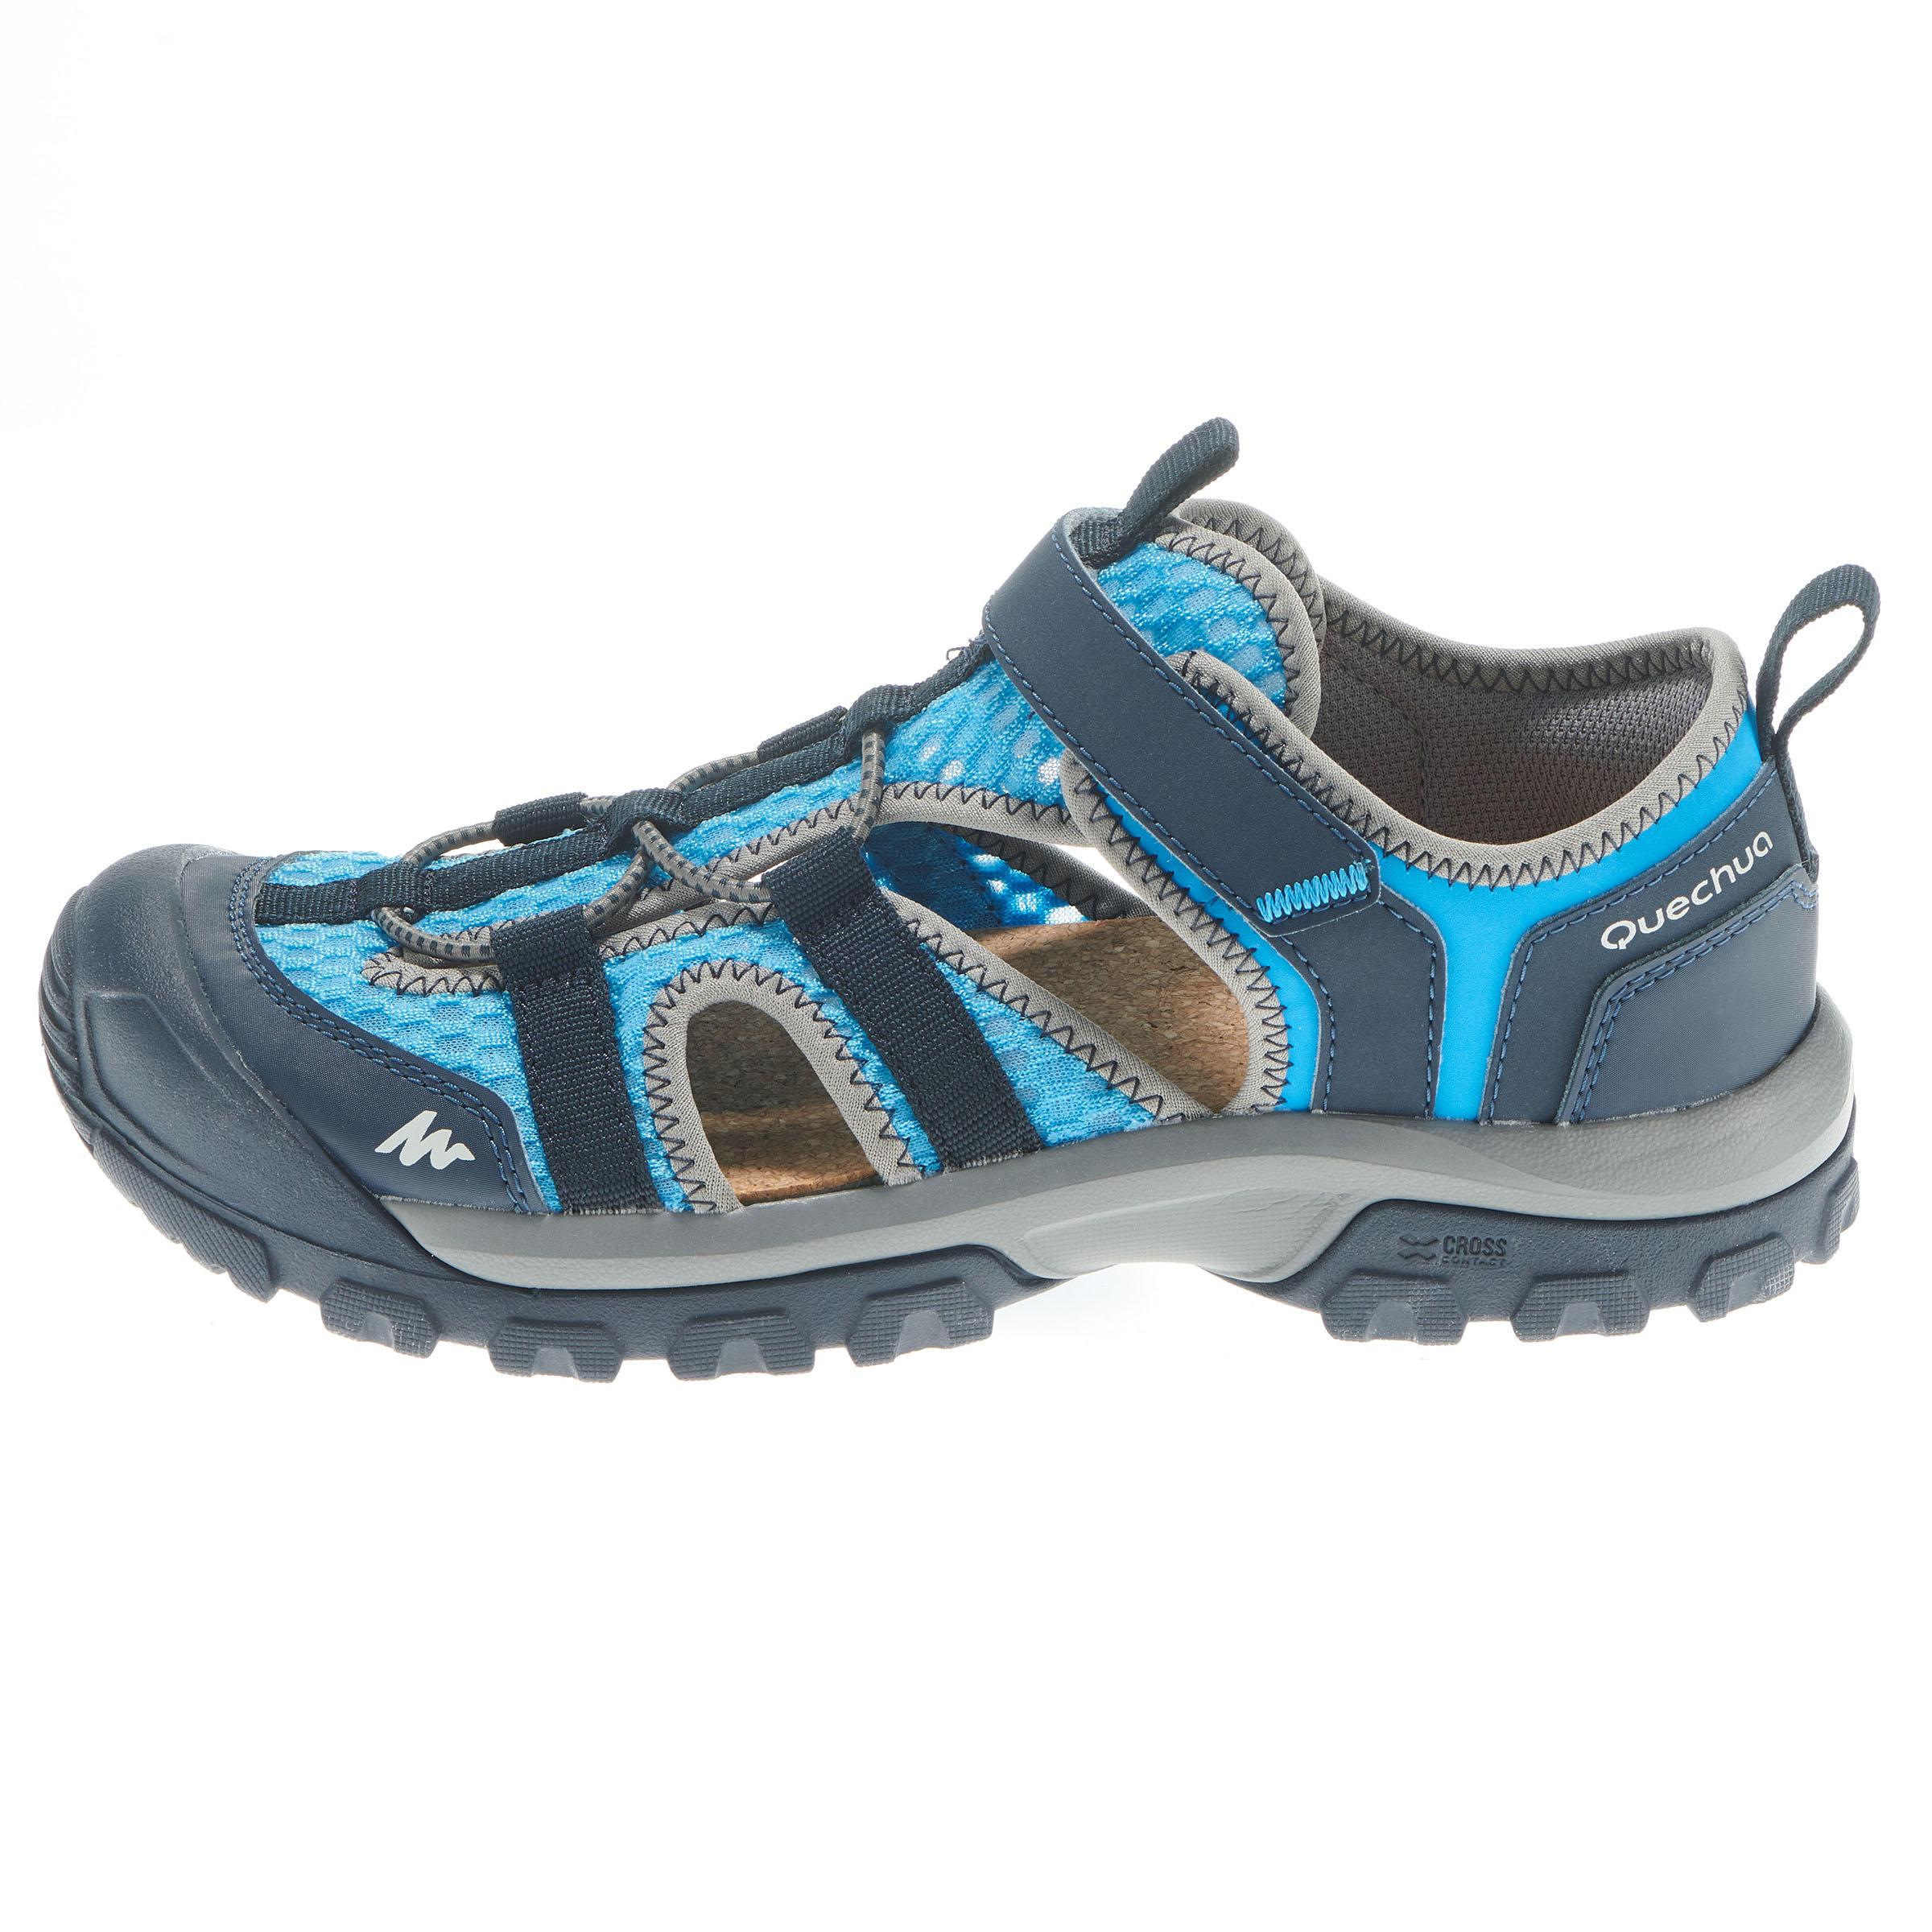 Kid's Sandals MH150 - Blue